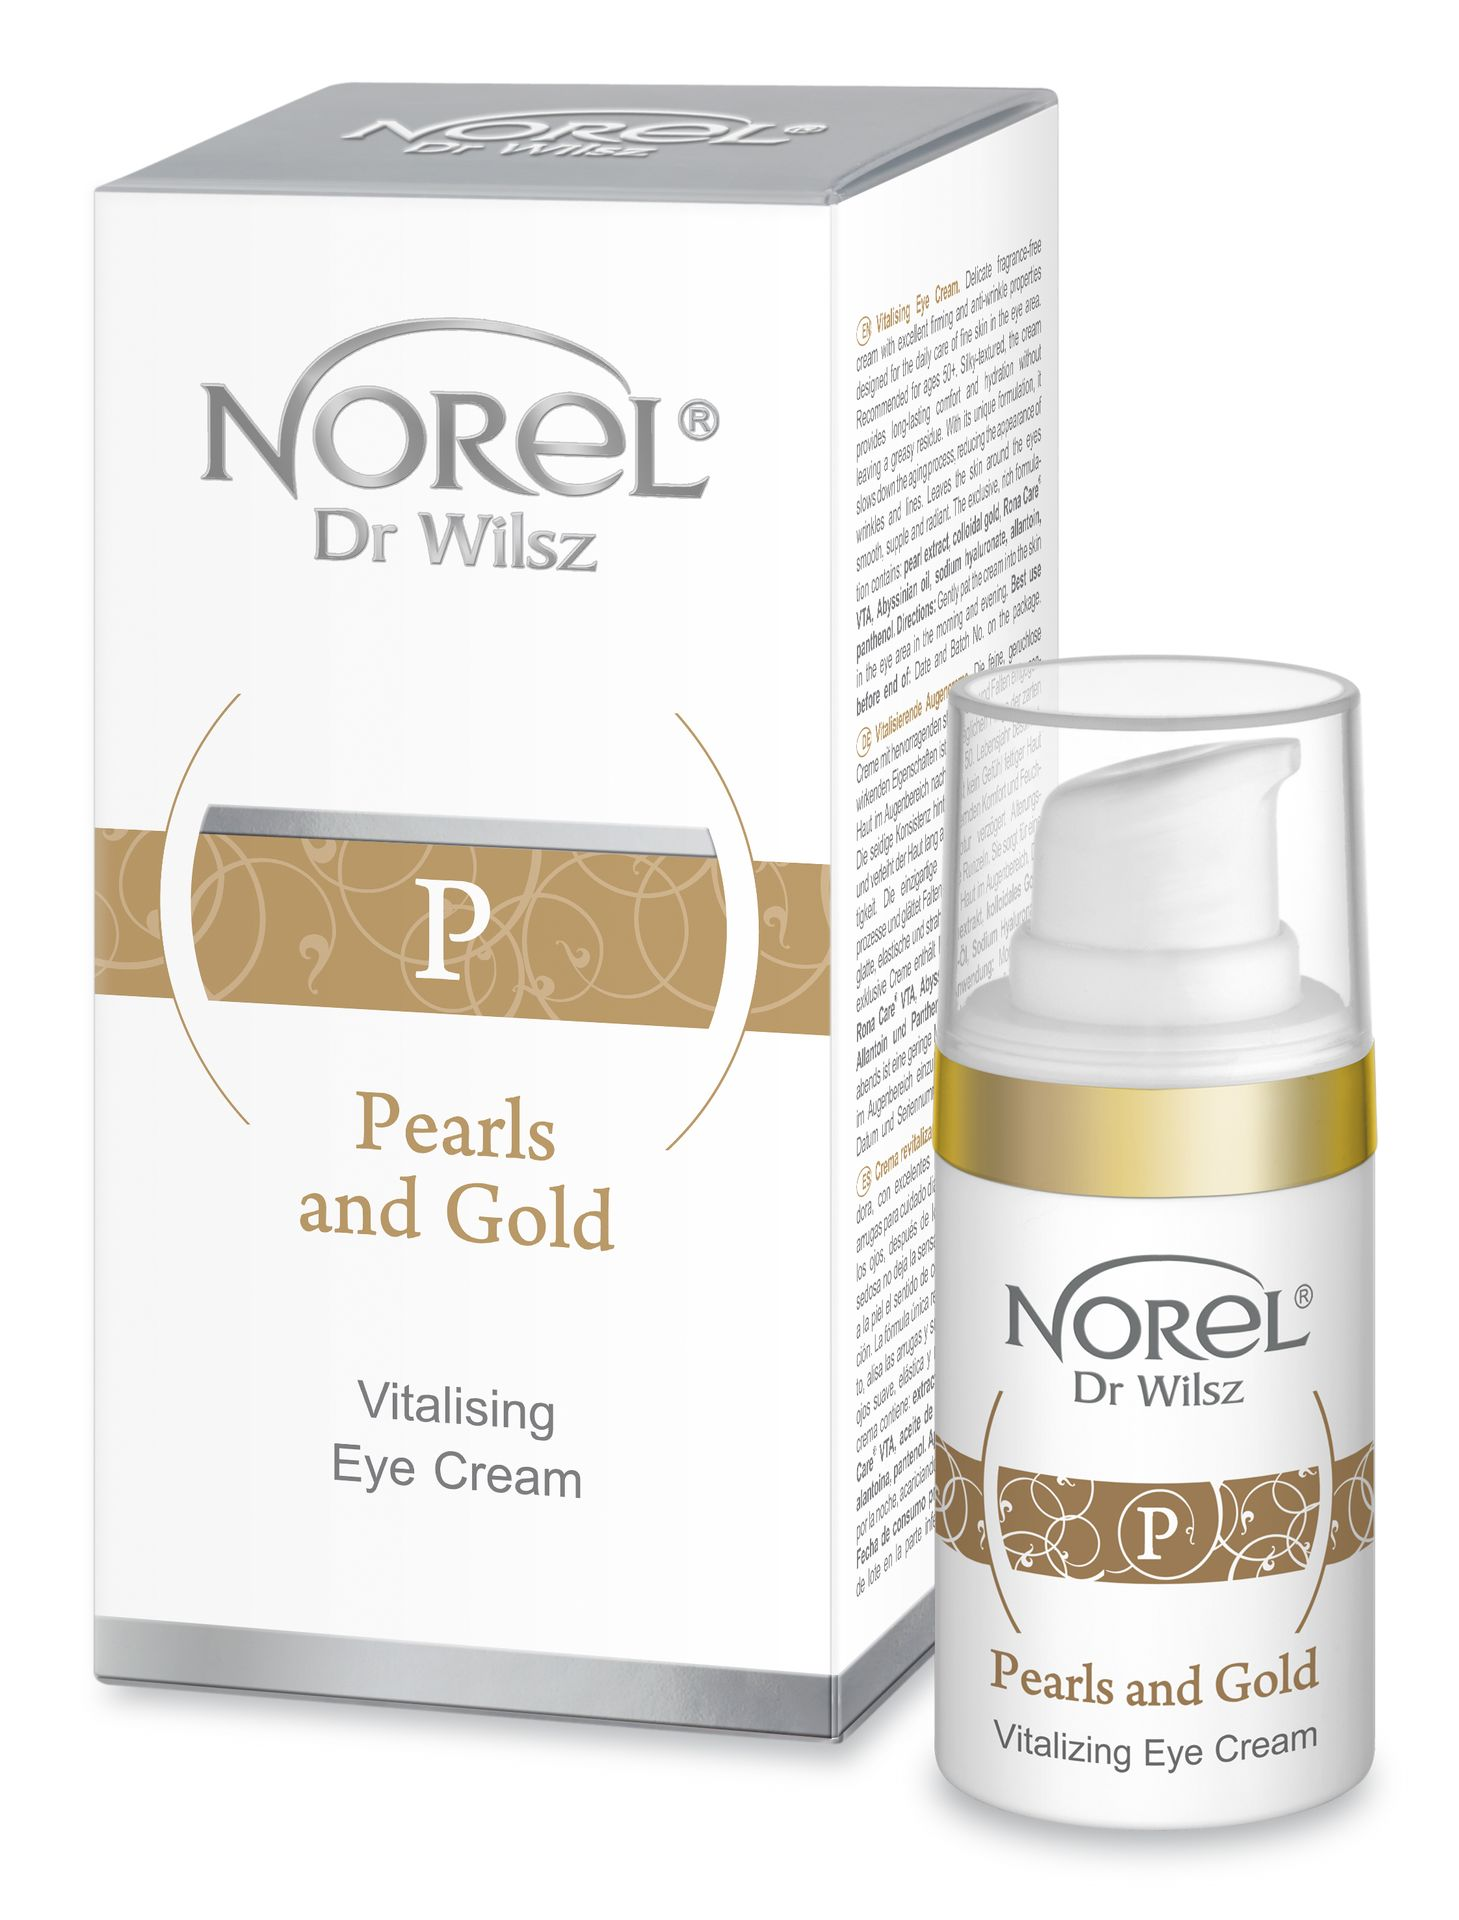 NOREL Dr. Wilsz Эмульсия восстанавливающая для зрелой кожи вокруг глаз / Pearls and Gold Vitalizing eye cream 15 мл - Эмульсии